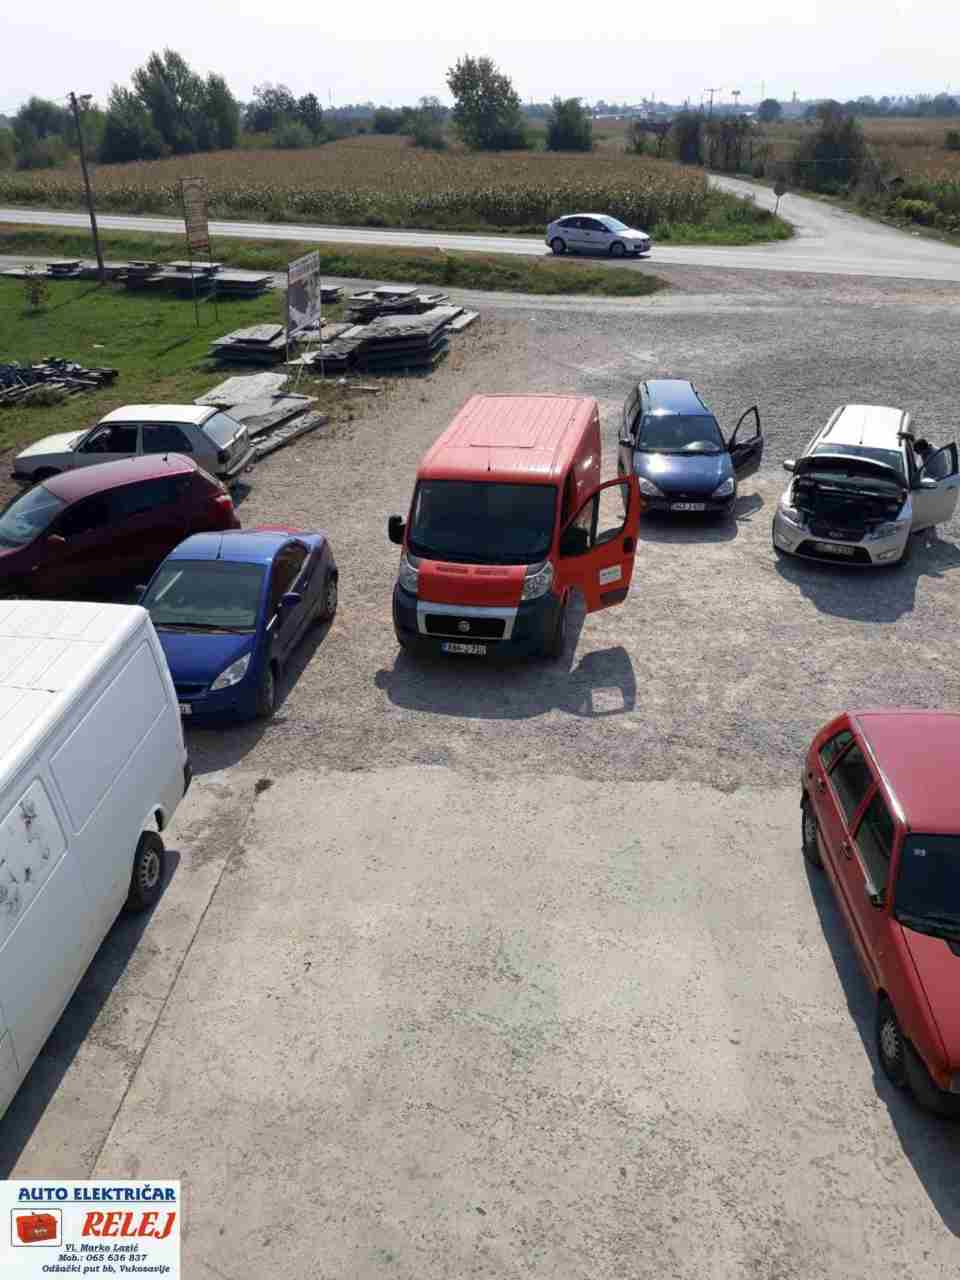 AUTO ELEKTRIČAR-RELEJ (1)